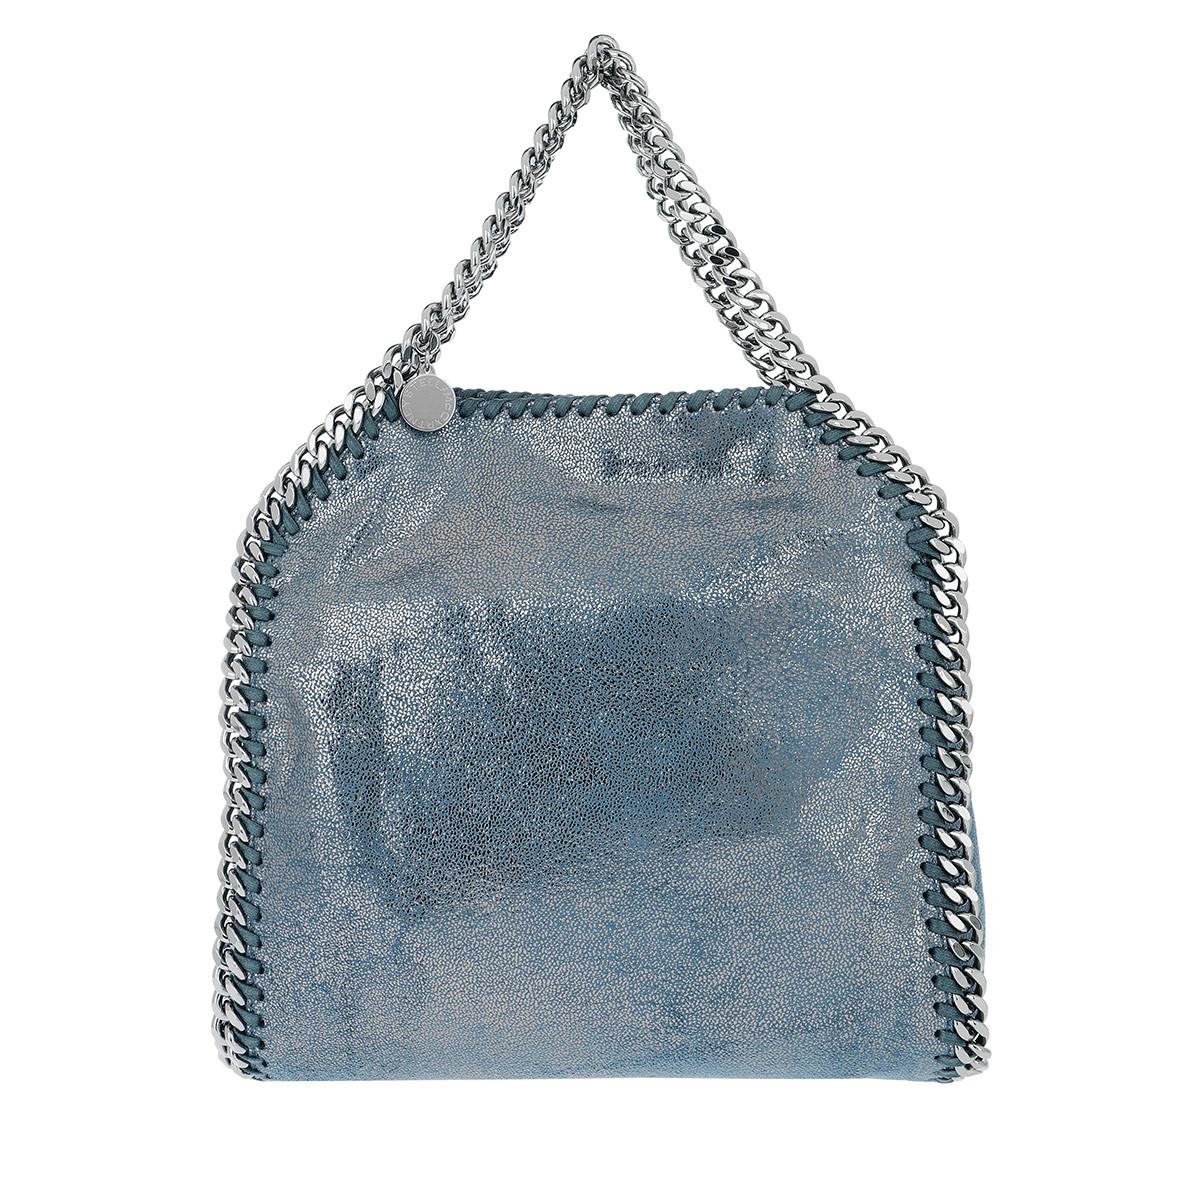 Stella Mccartney Stella Mc Cartney Tassen met handvat - Falabella Fold-Over Tote Blue Lagoon in blauw voor dames Goedkope Pick Een Best b8NLKpzQQG